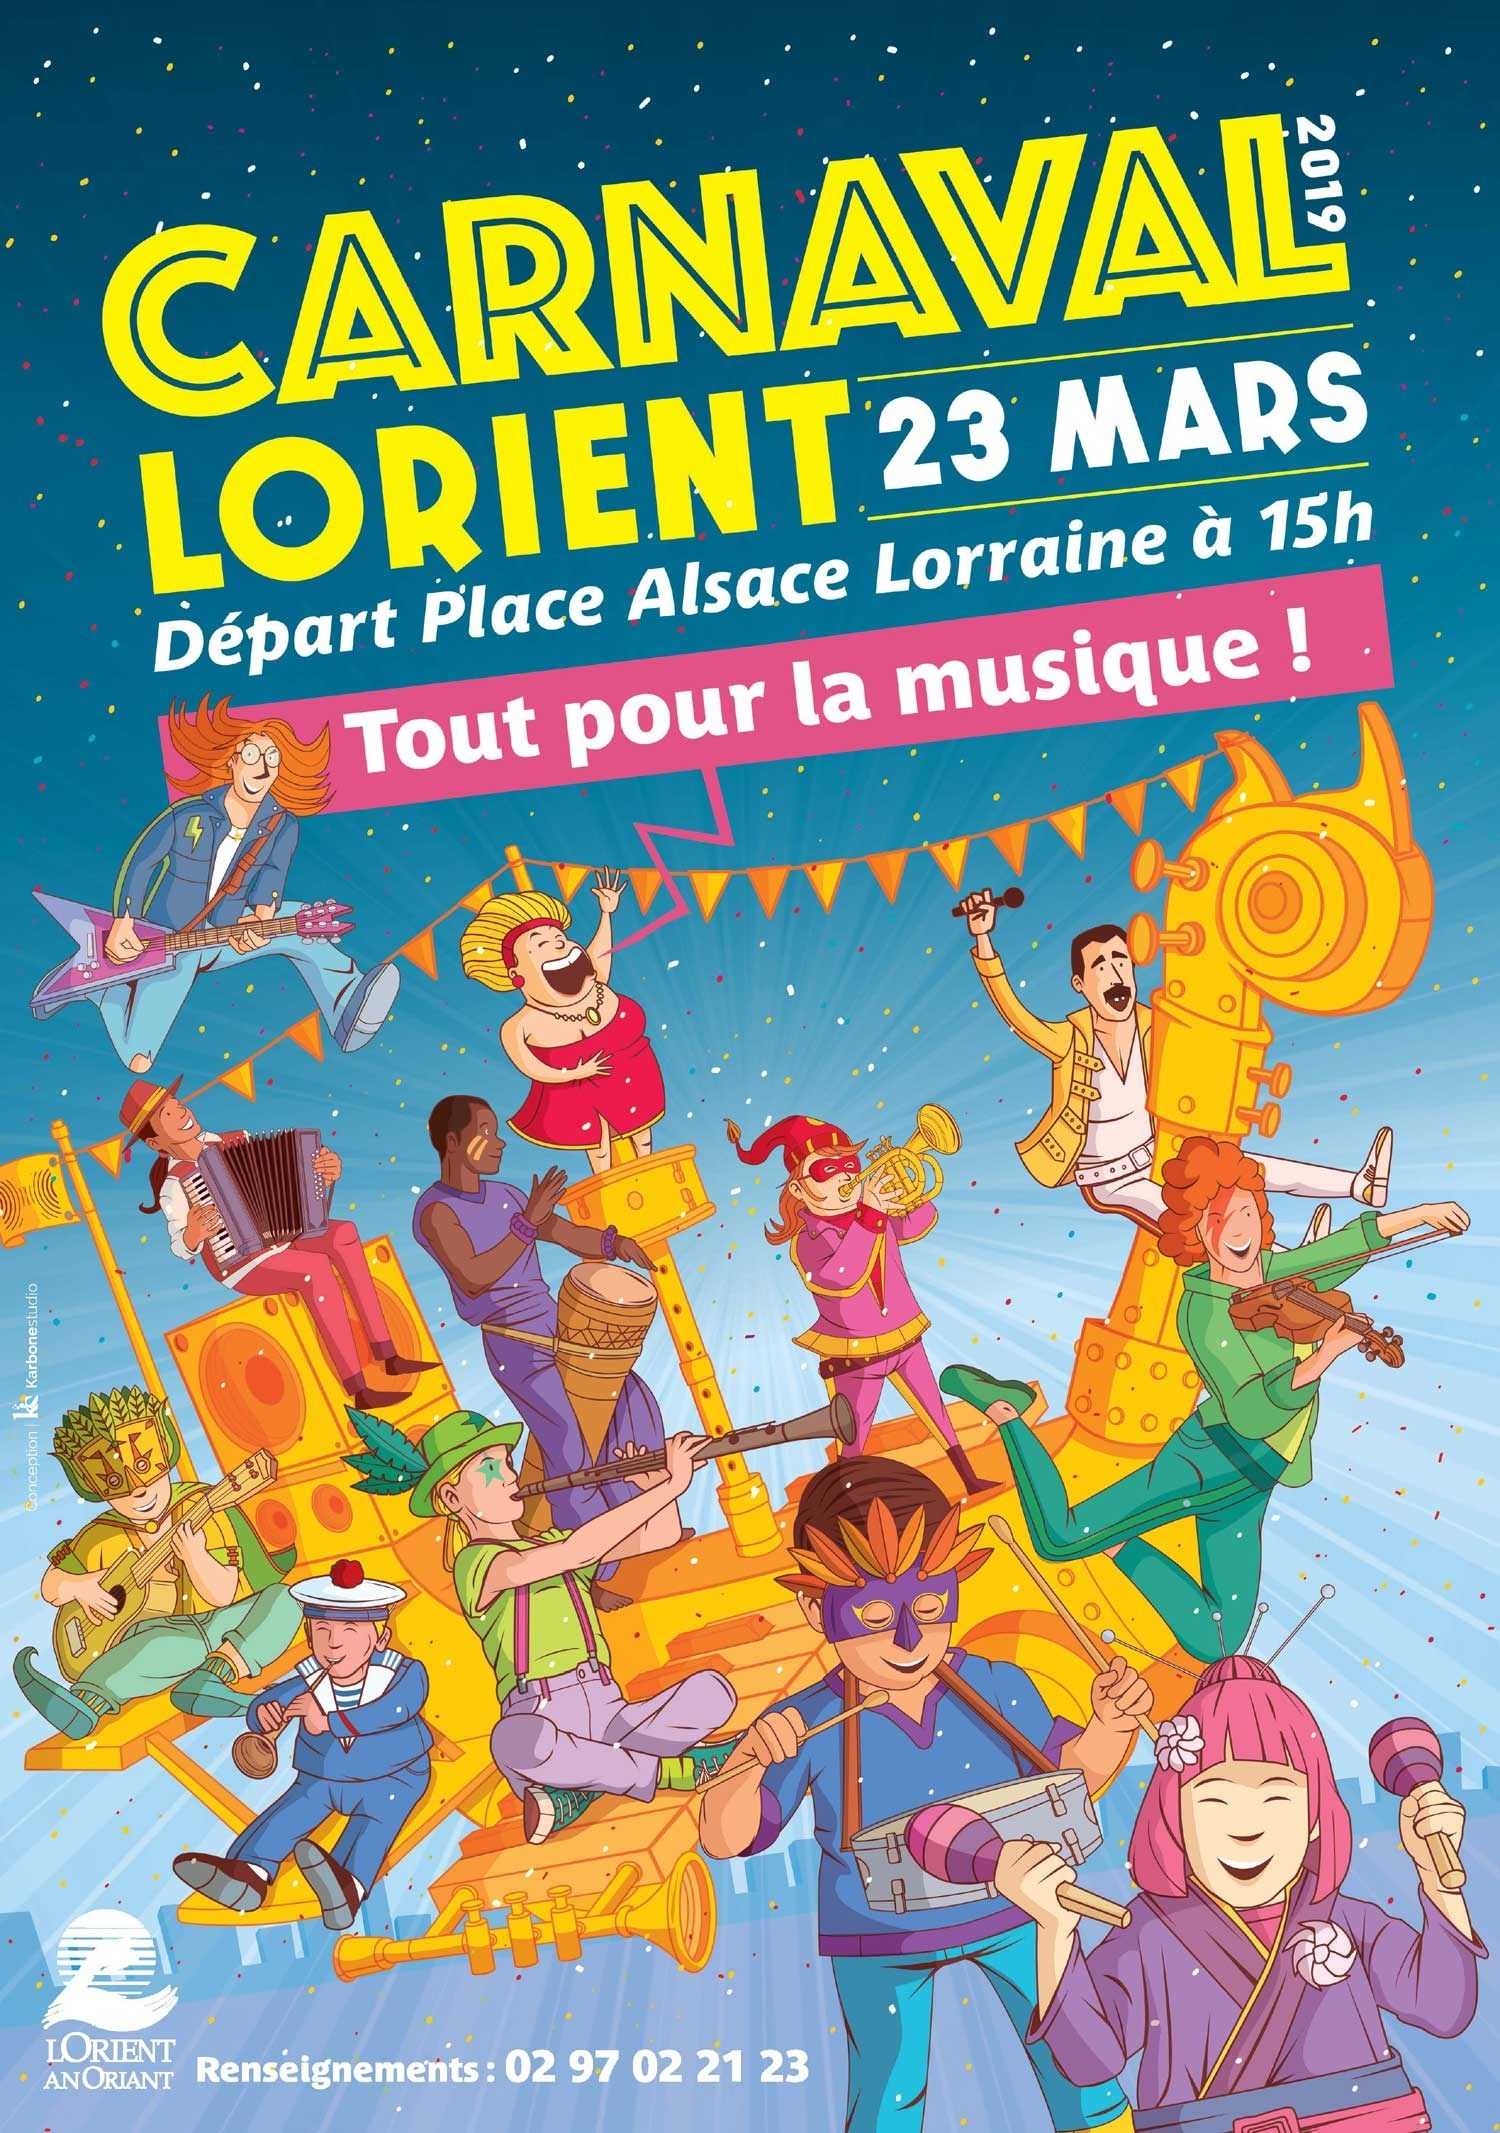 Carnaval de Lorient 2019